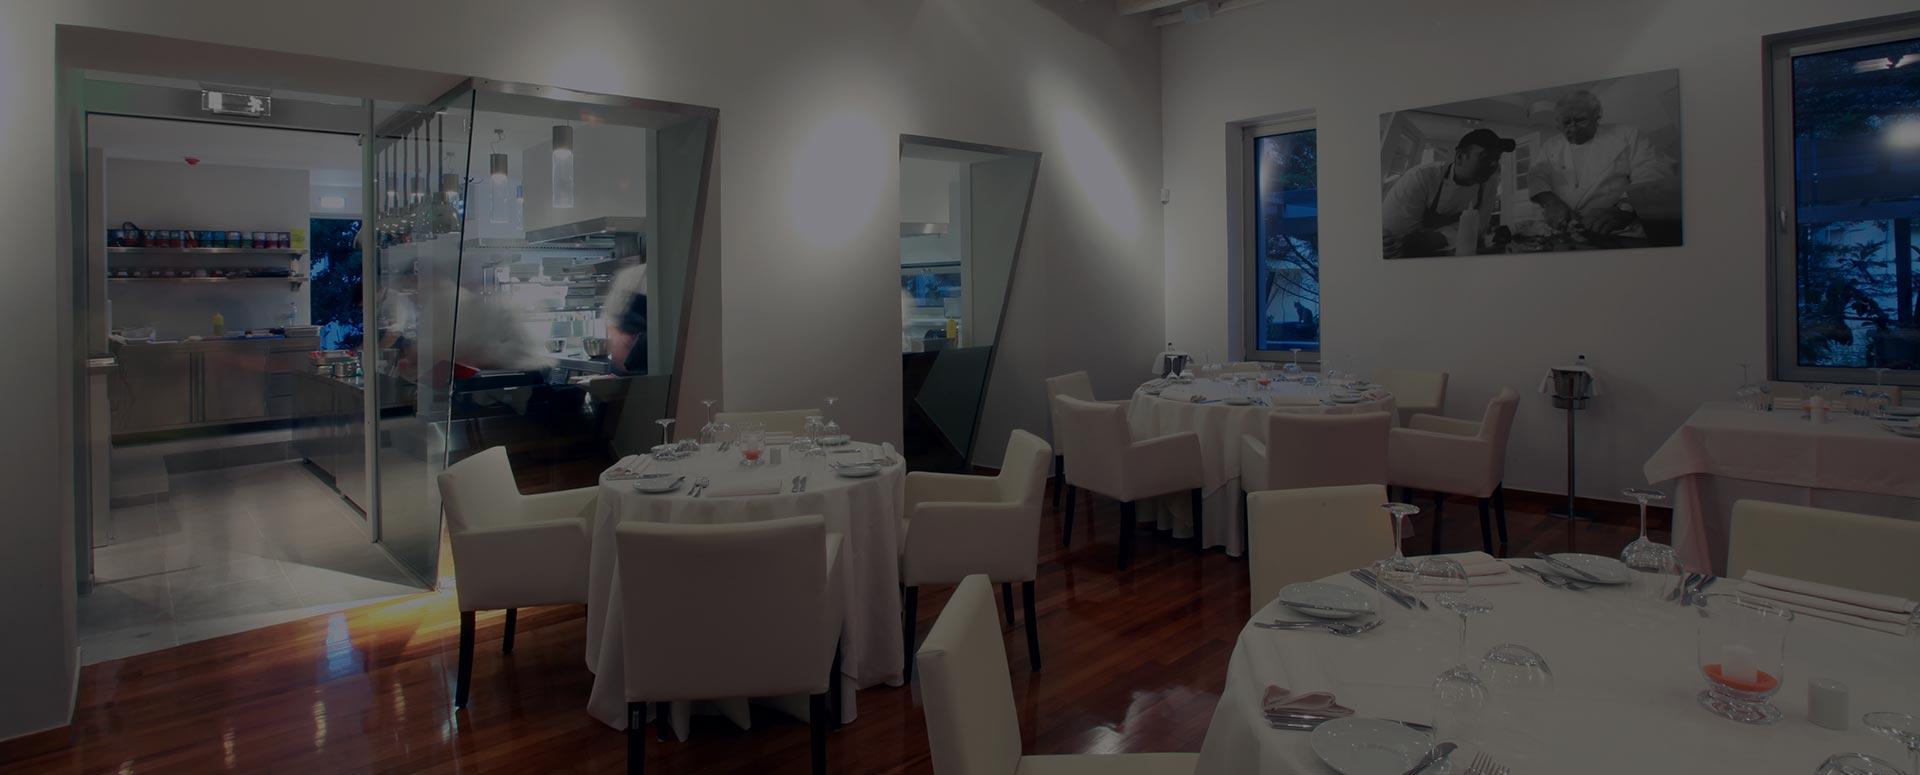 Botrini's Εστιατόριο Αθήνα